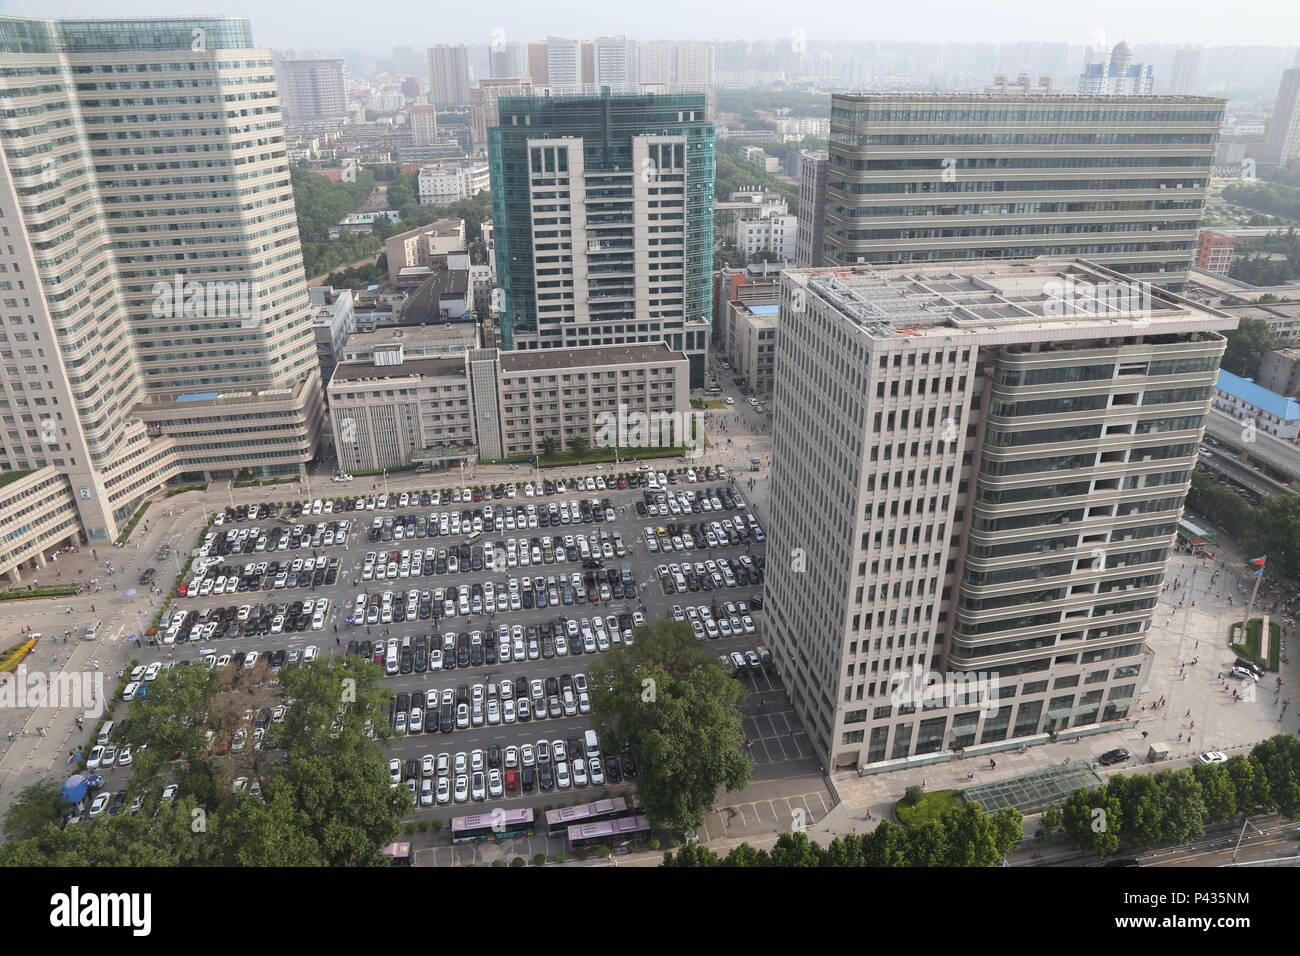 Henan China Stockfotos & Henan China Bilder - Seite 8 - Alamy